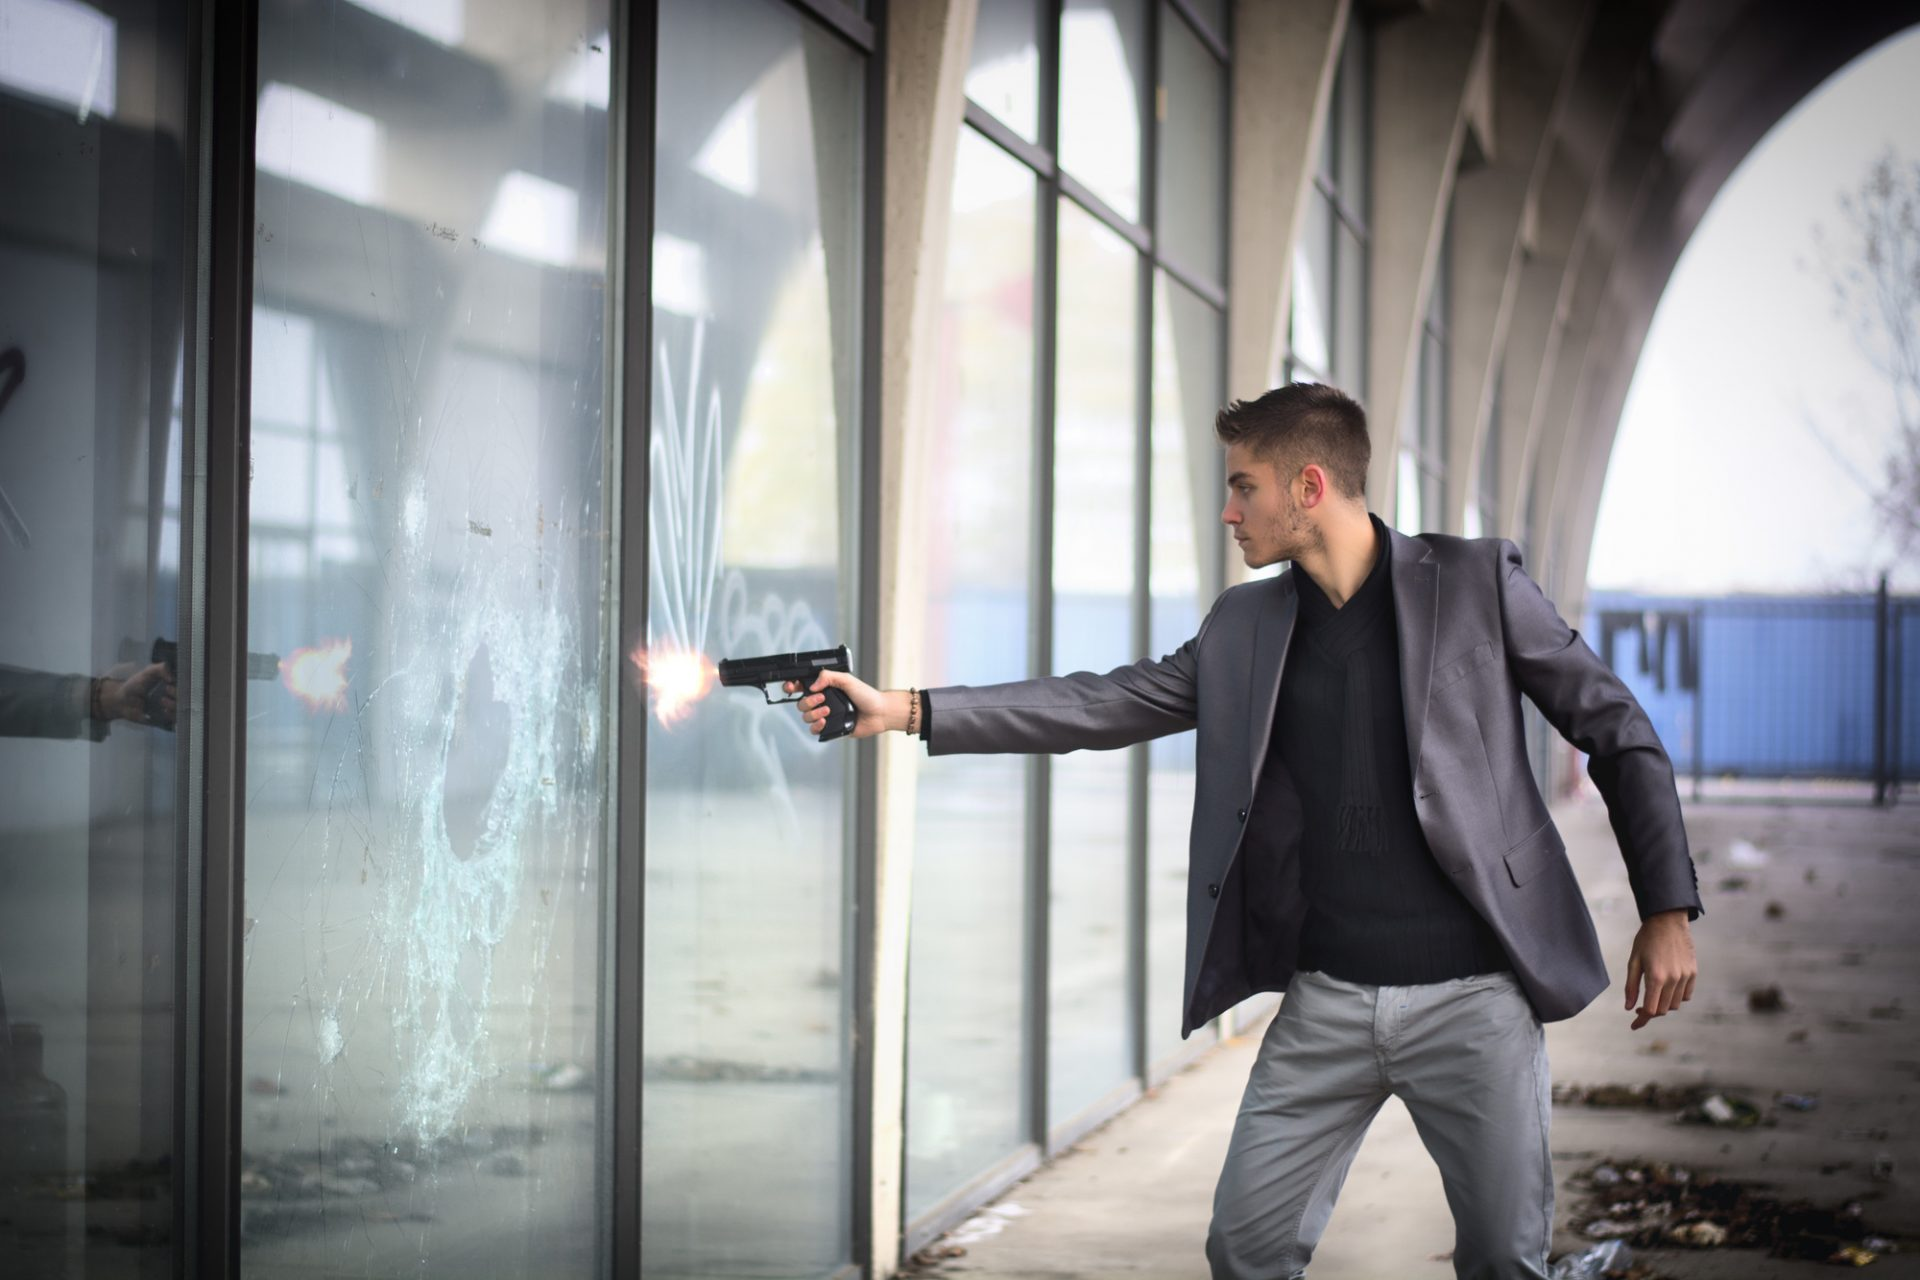 Security Window Films